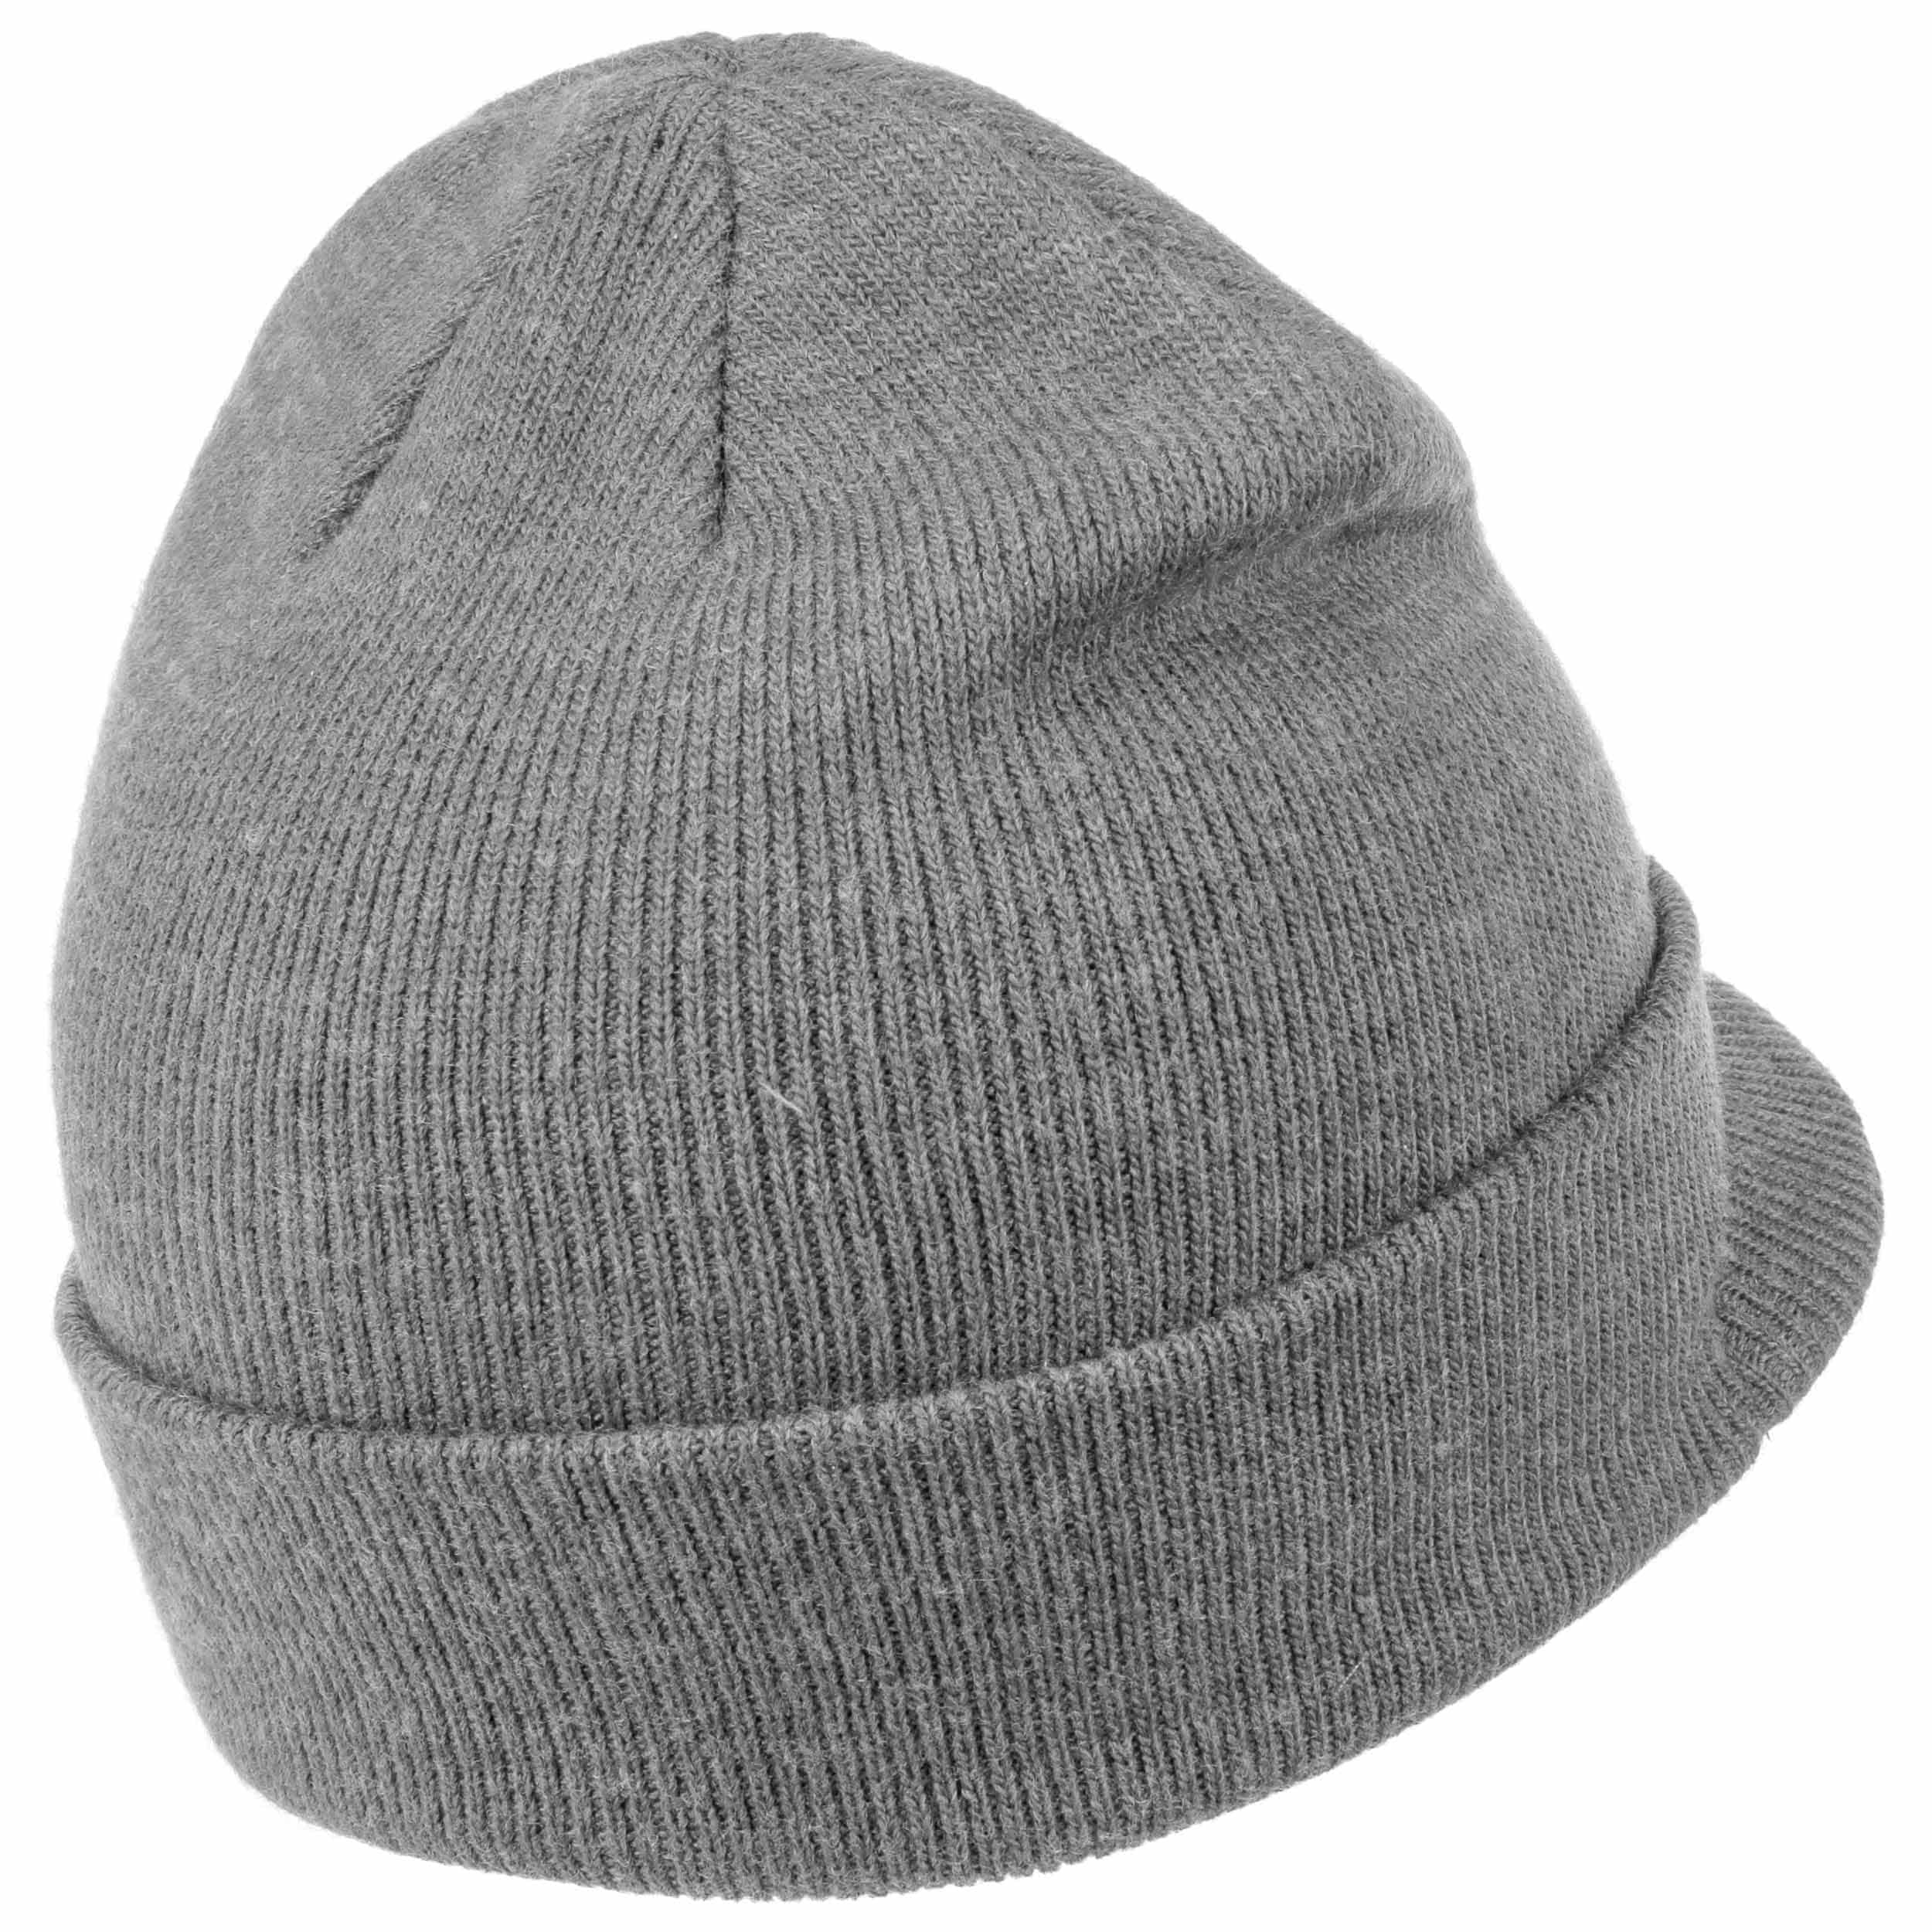 2b08a30d136 Otto winter hat eisbär eur hats caps beanies shop jpg 2500x2500 Grey winter  hat